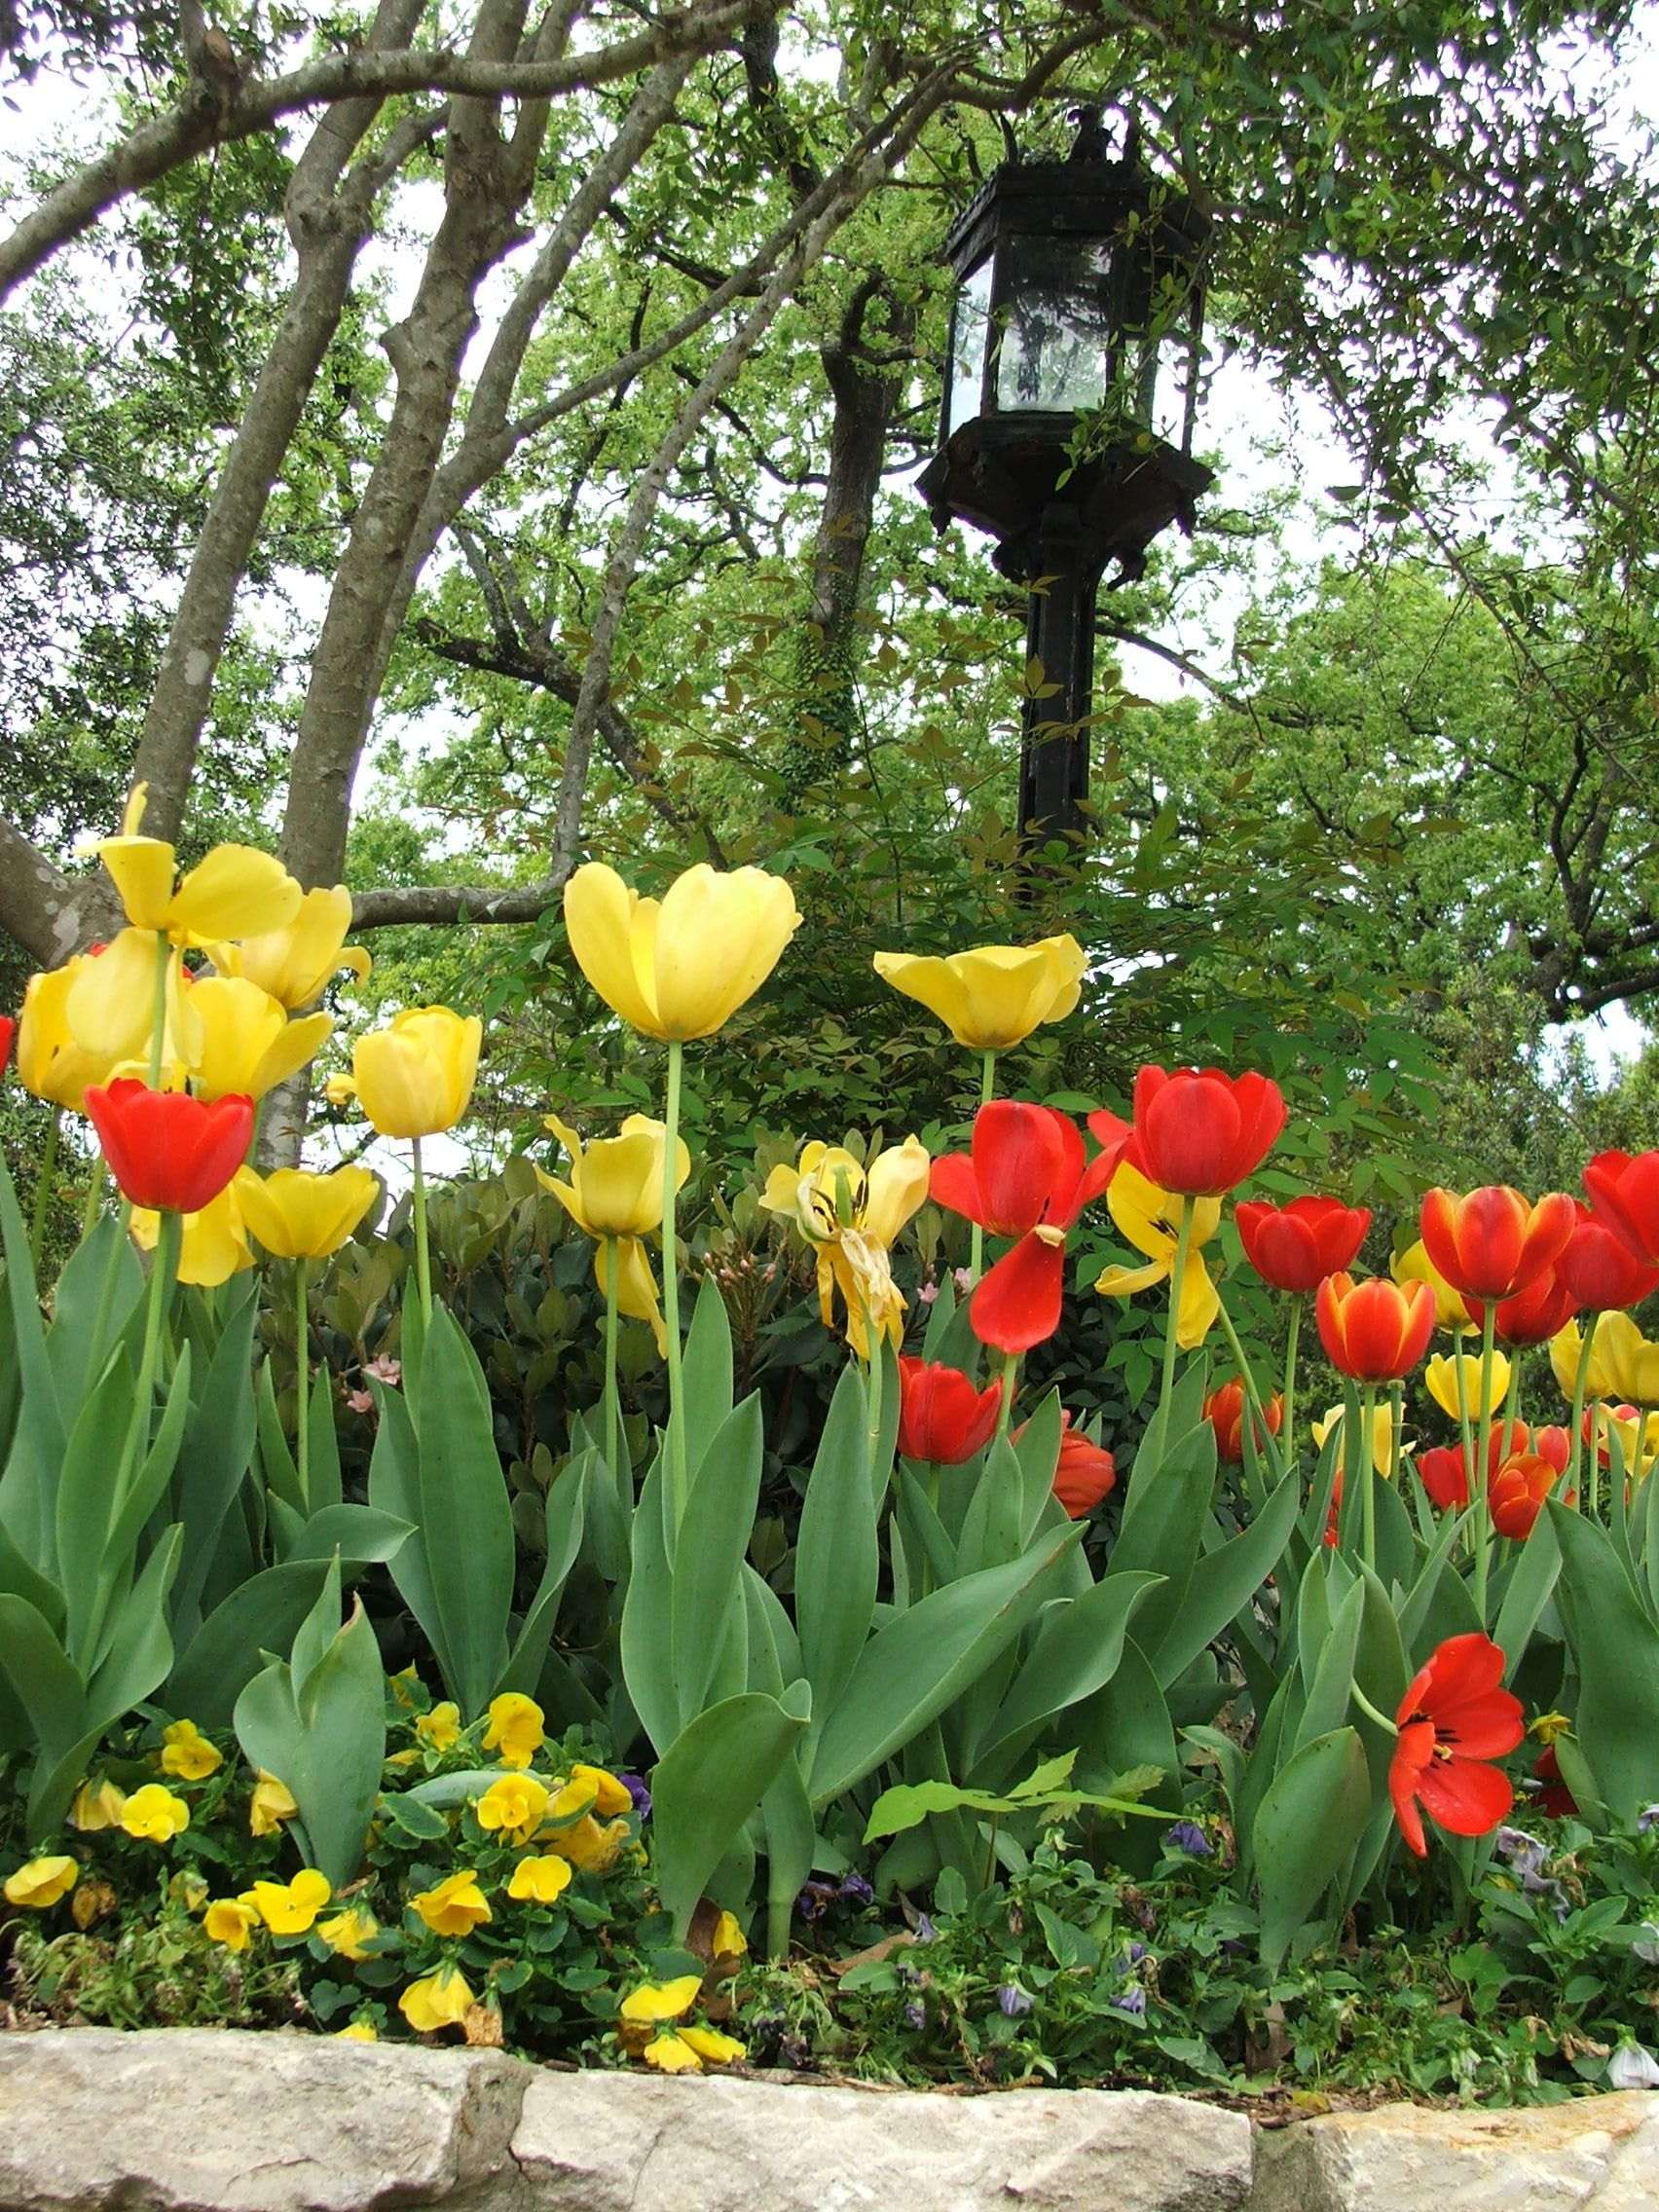 Beautiful tulips as seen during the Azalea Trail in Tyler